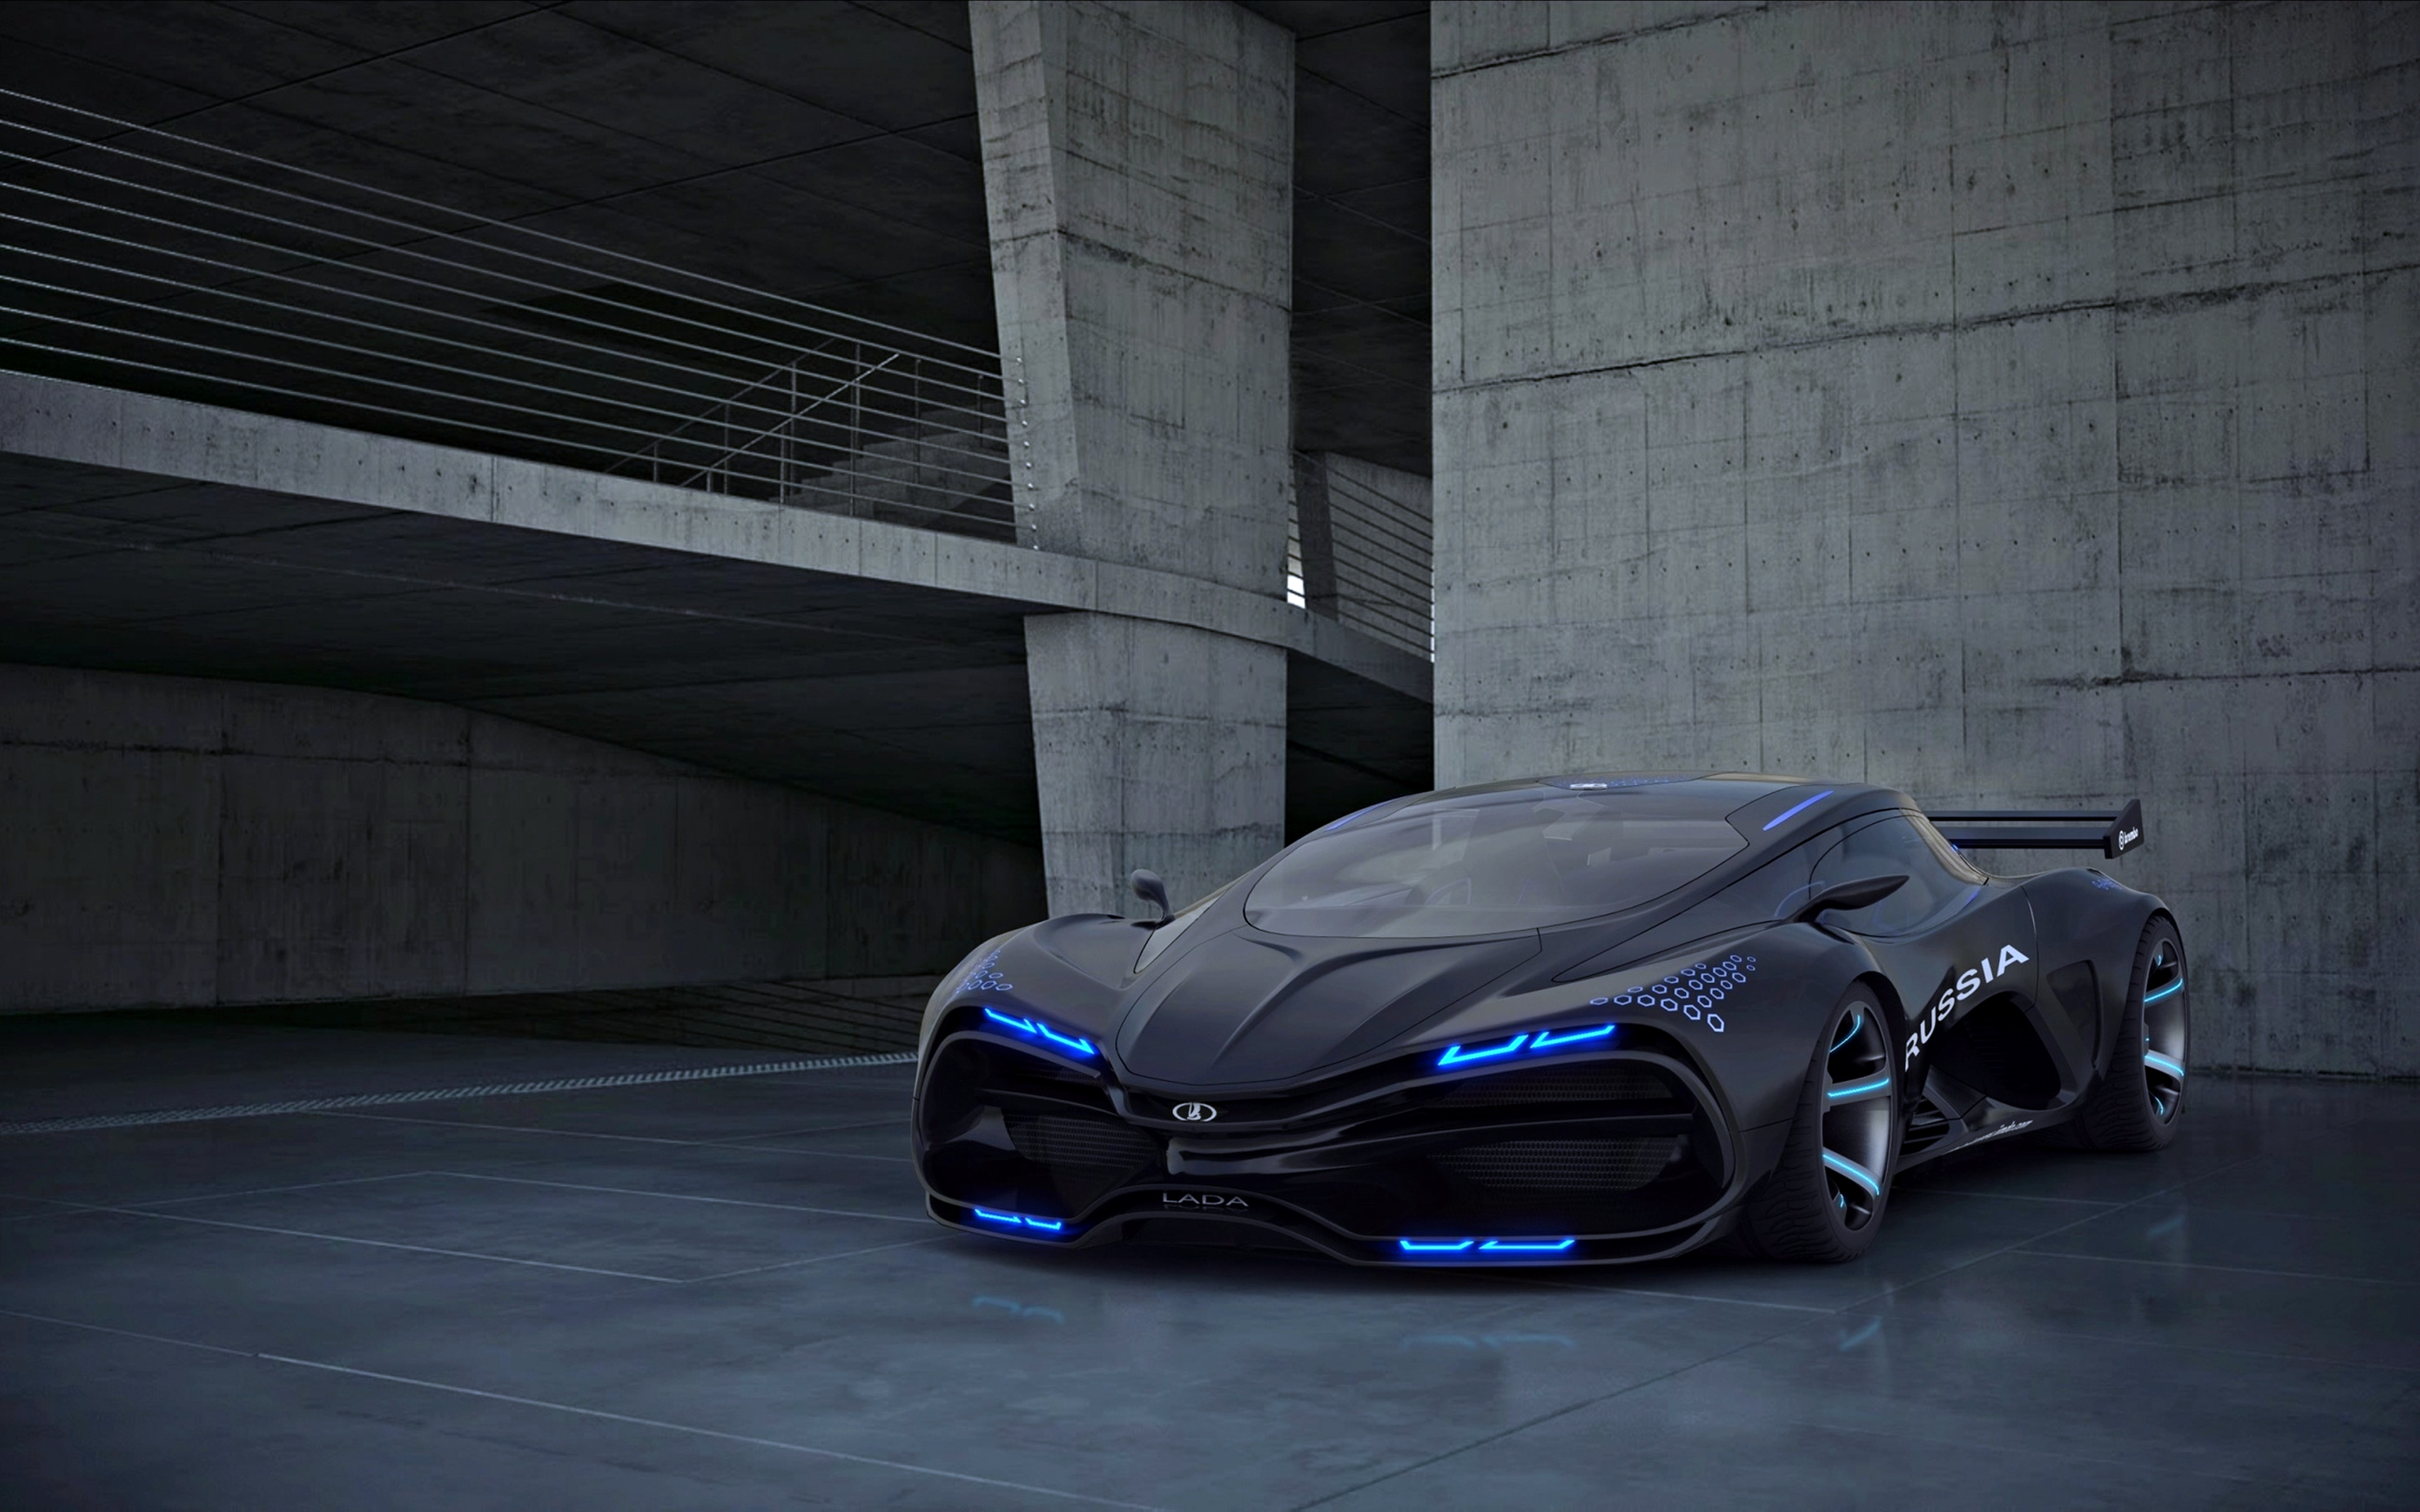 Lada Raven Concept Cars 4K